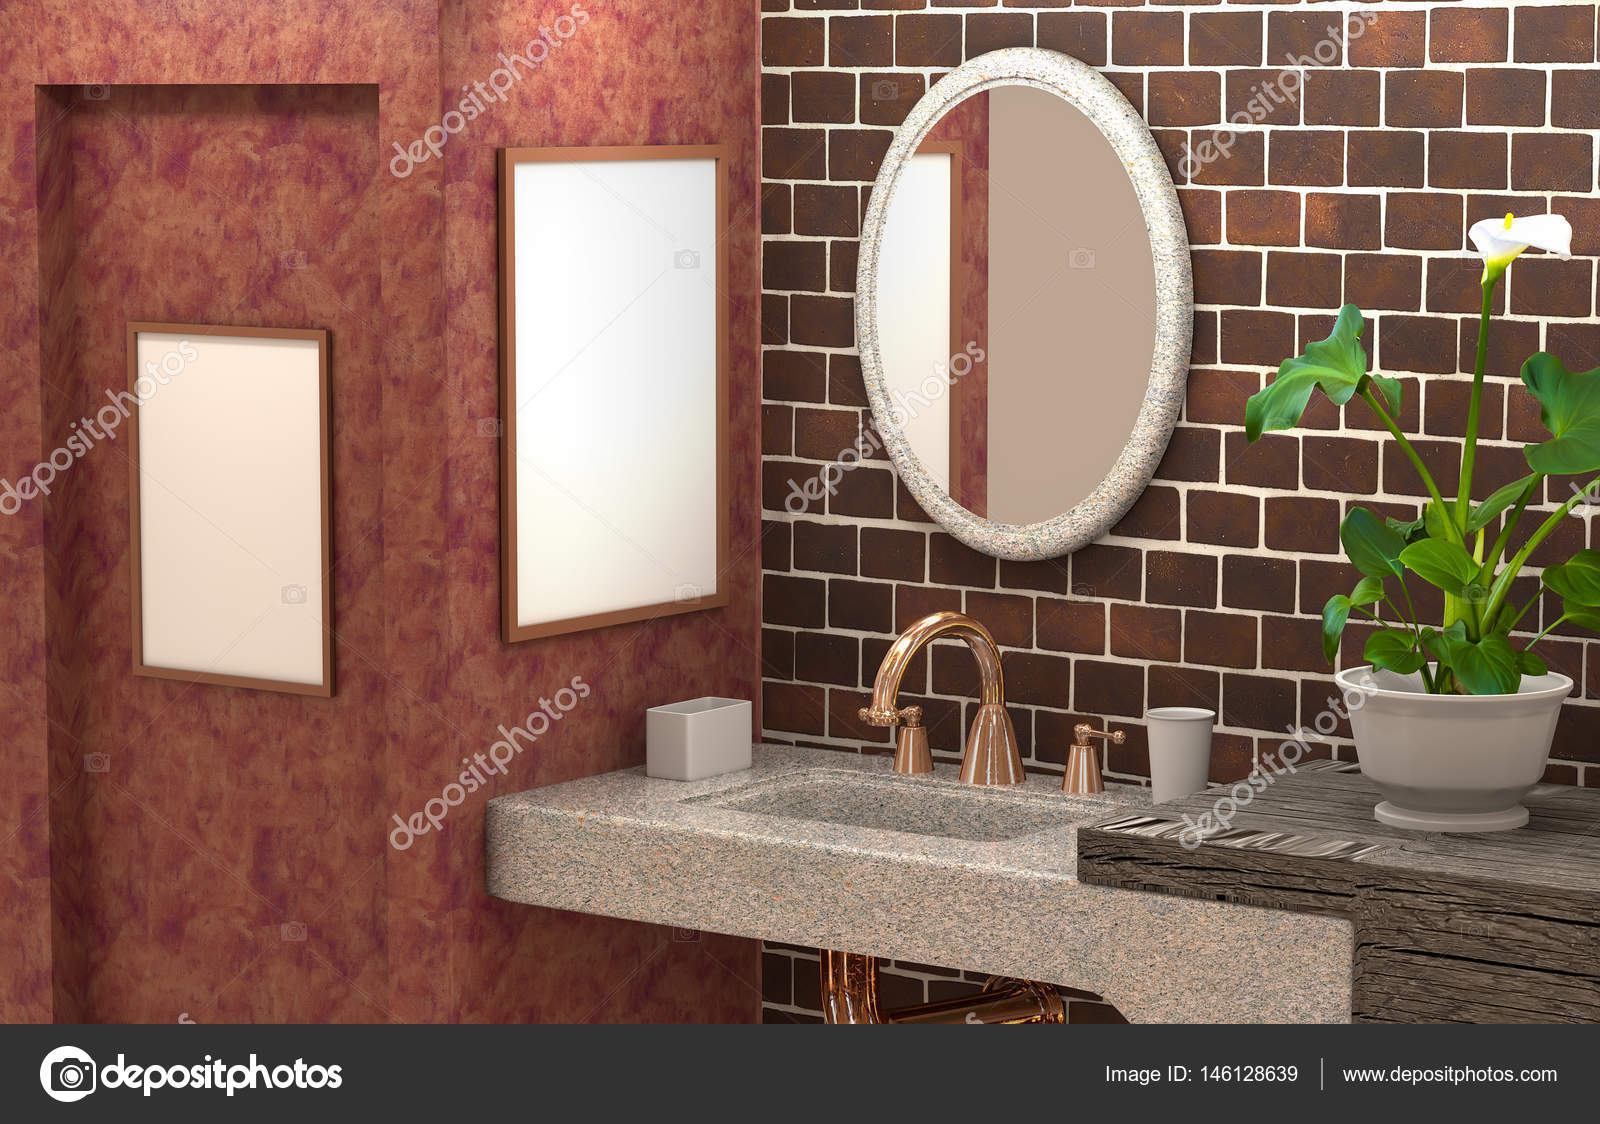 Badkamer Beton Interieur : D interieur van de badkamer met betonnen muur abstract furnitu